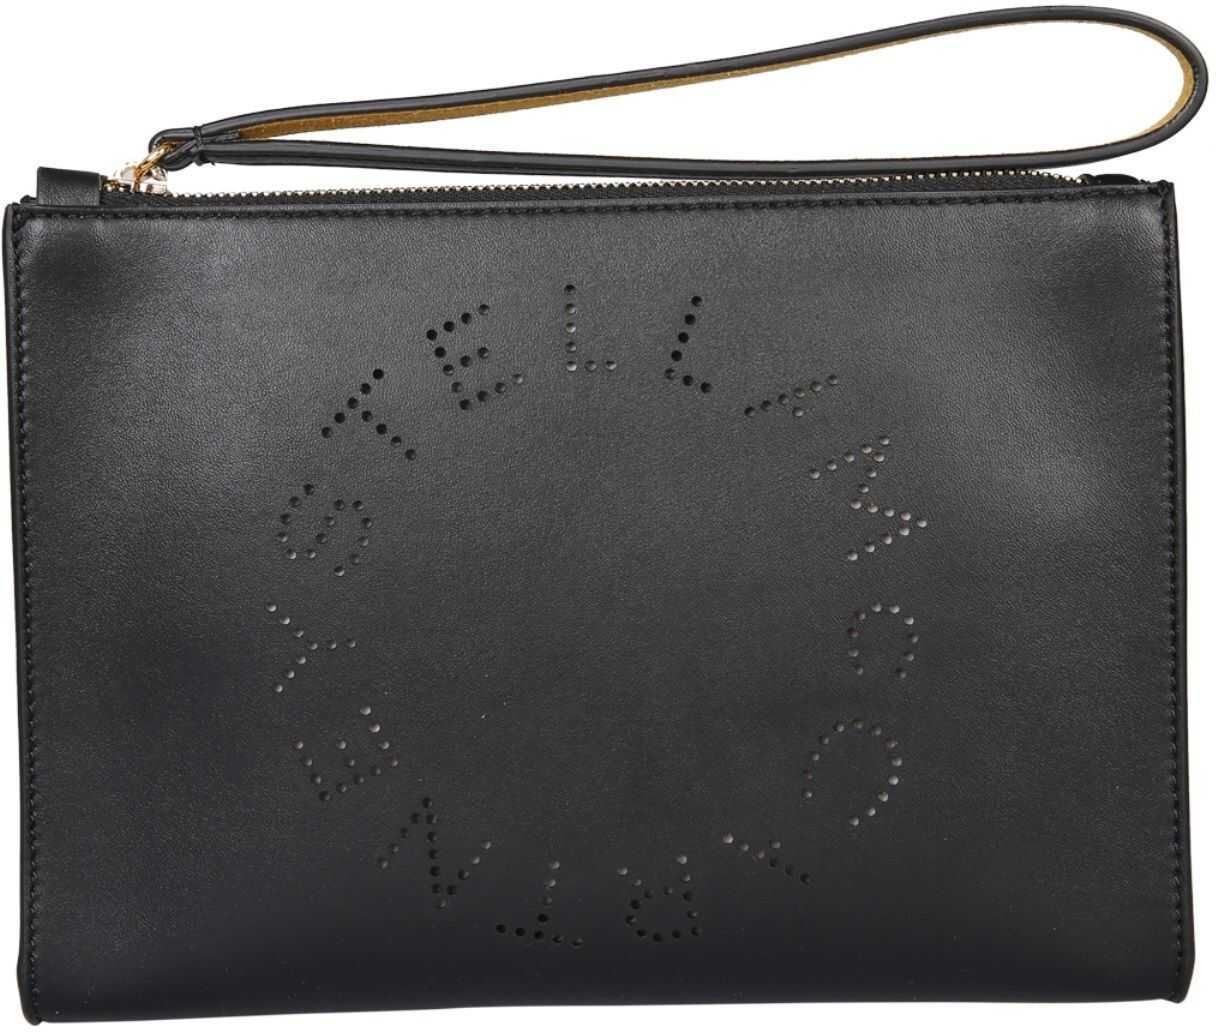 Stella McCartney Pouch With Logo 502892_W85421000 BLACK imagine b-mall.ro